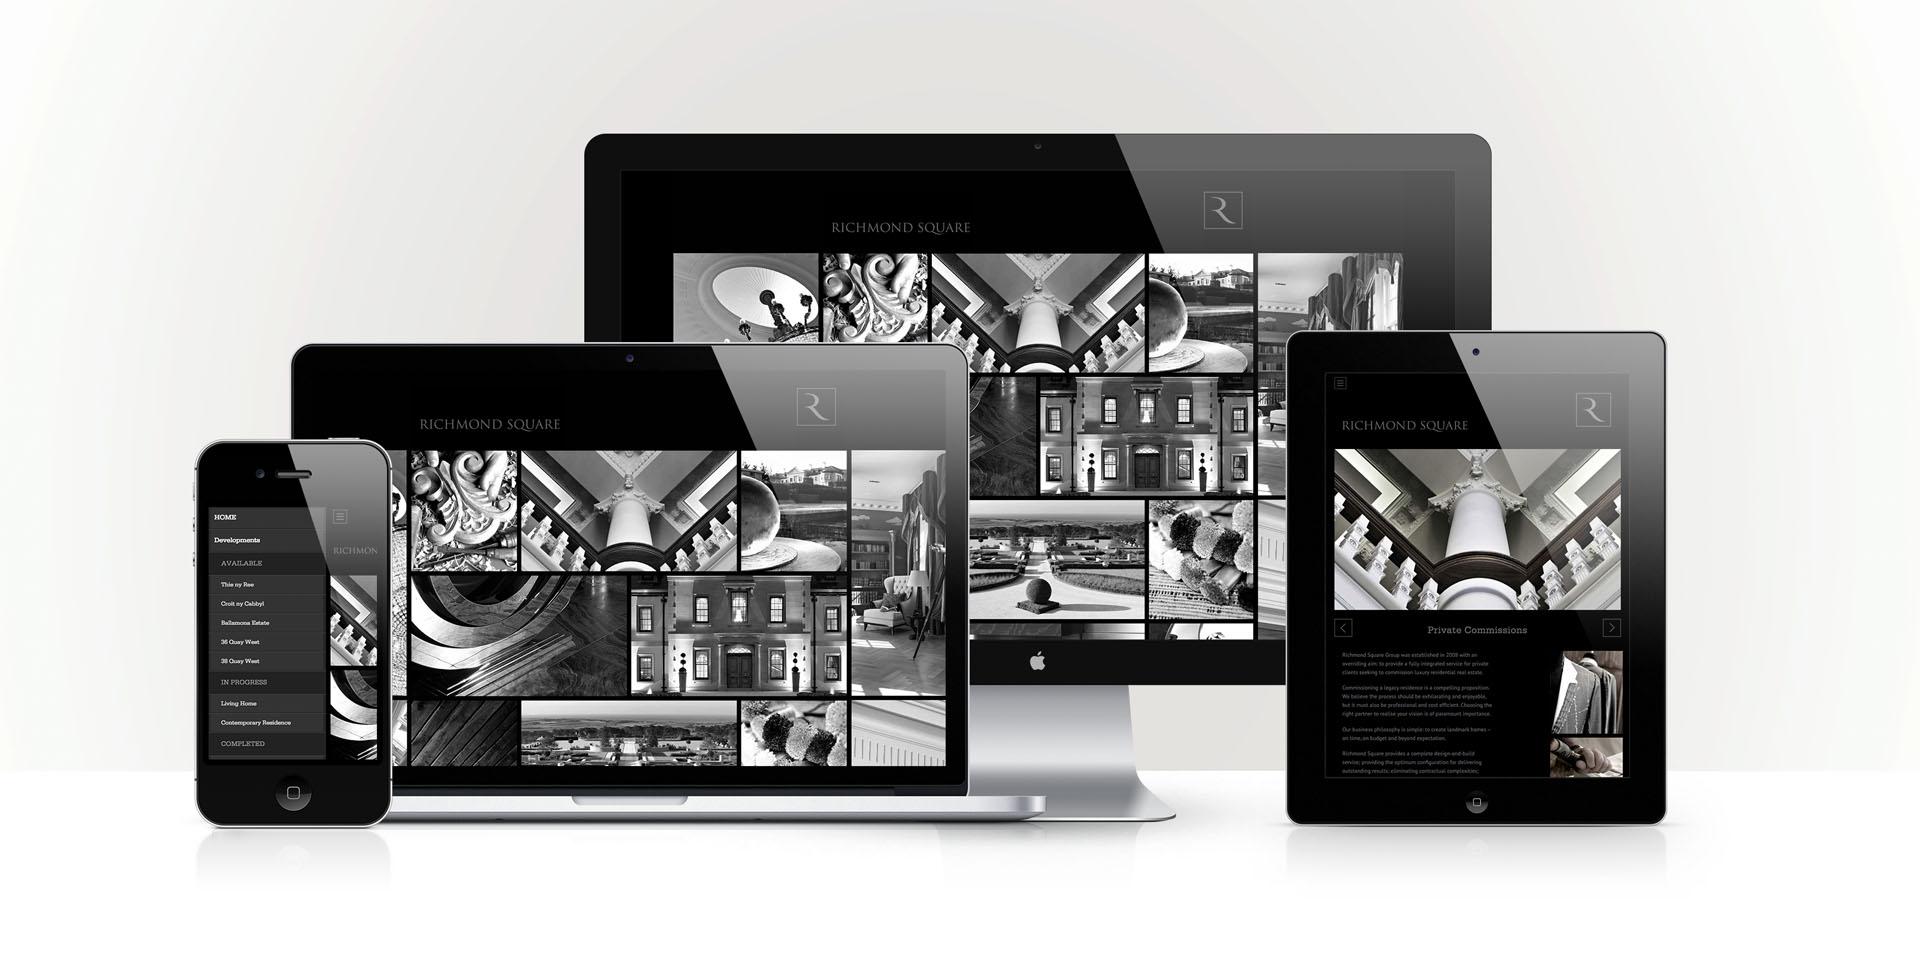 Richmond Square responsive website